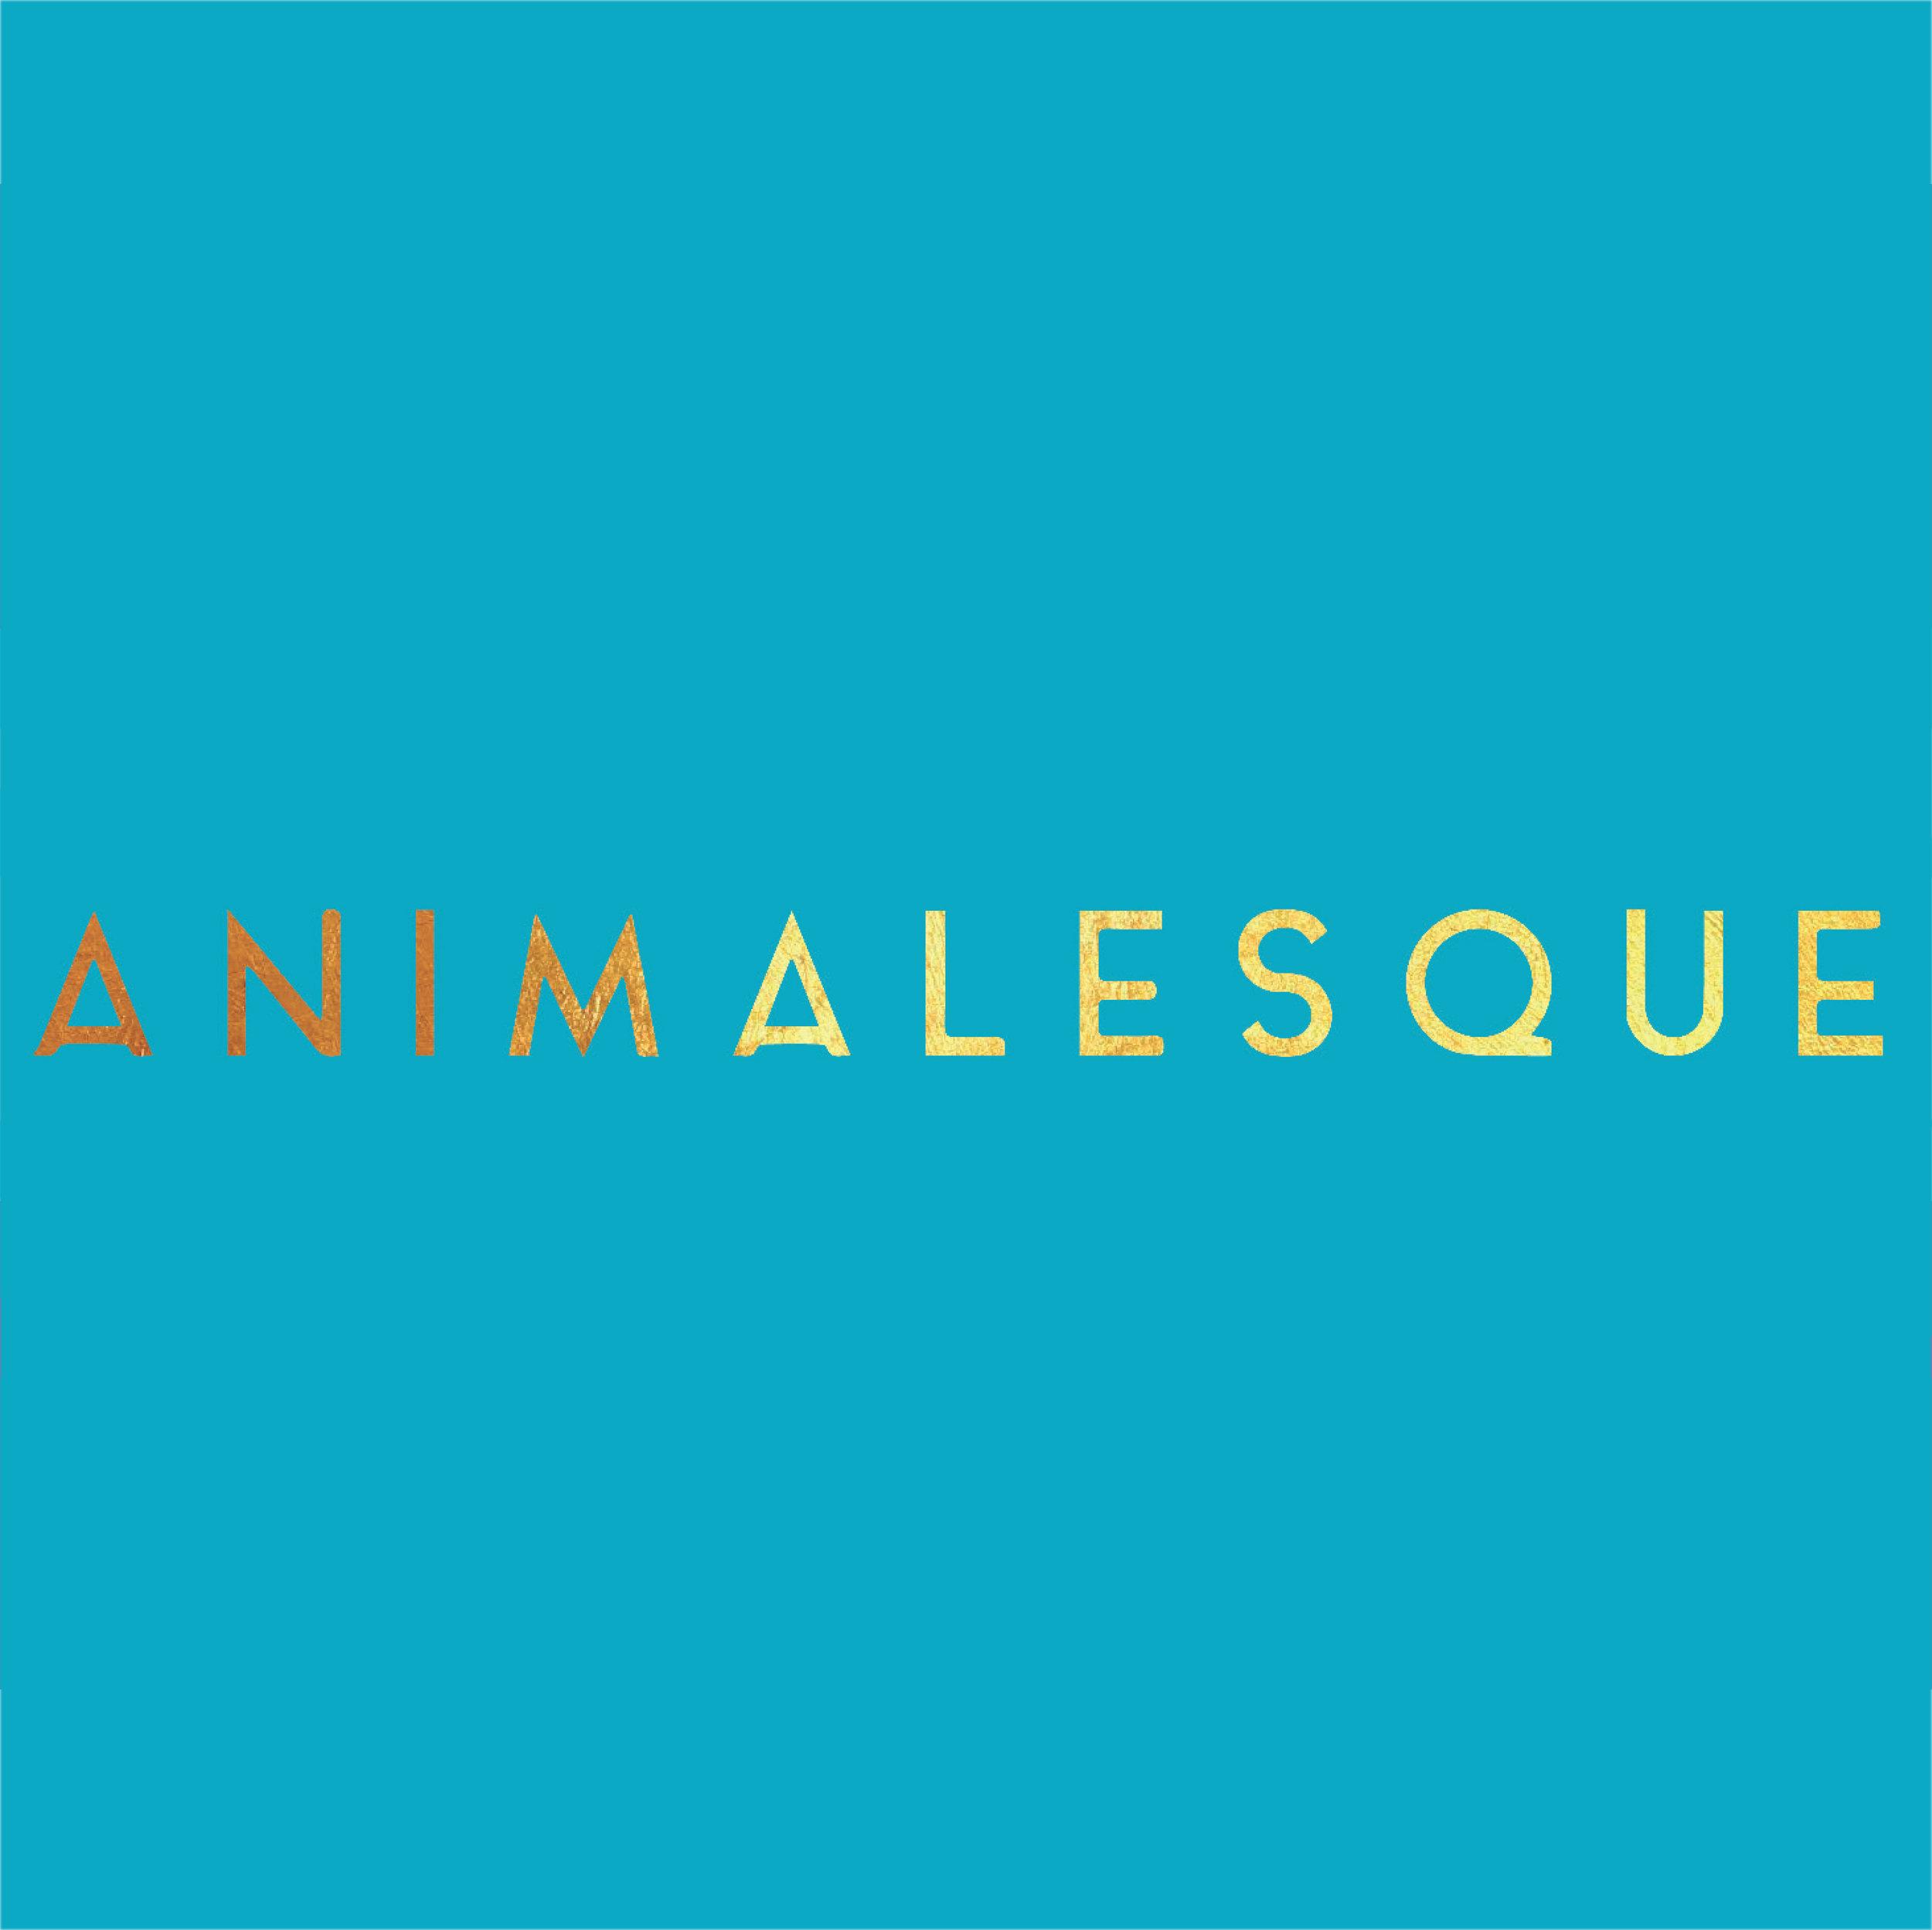 Animalesque blue gold.jpg